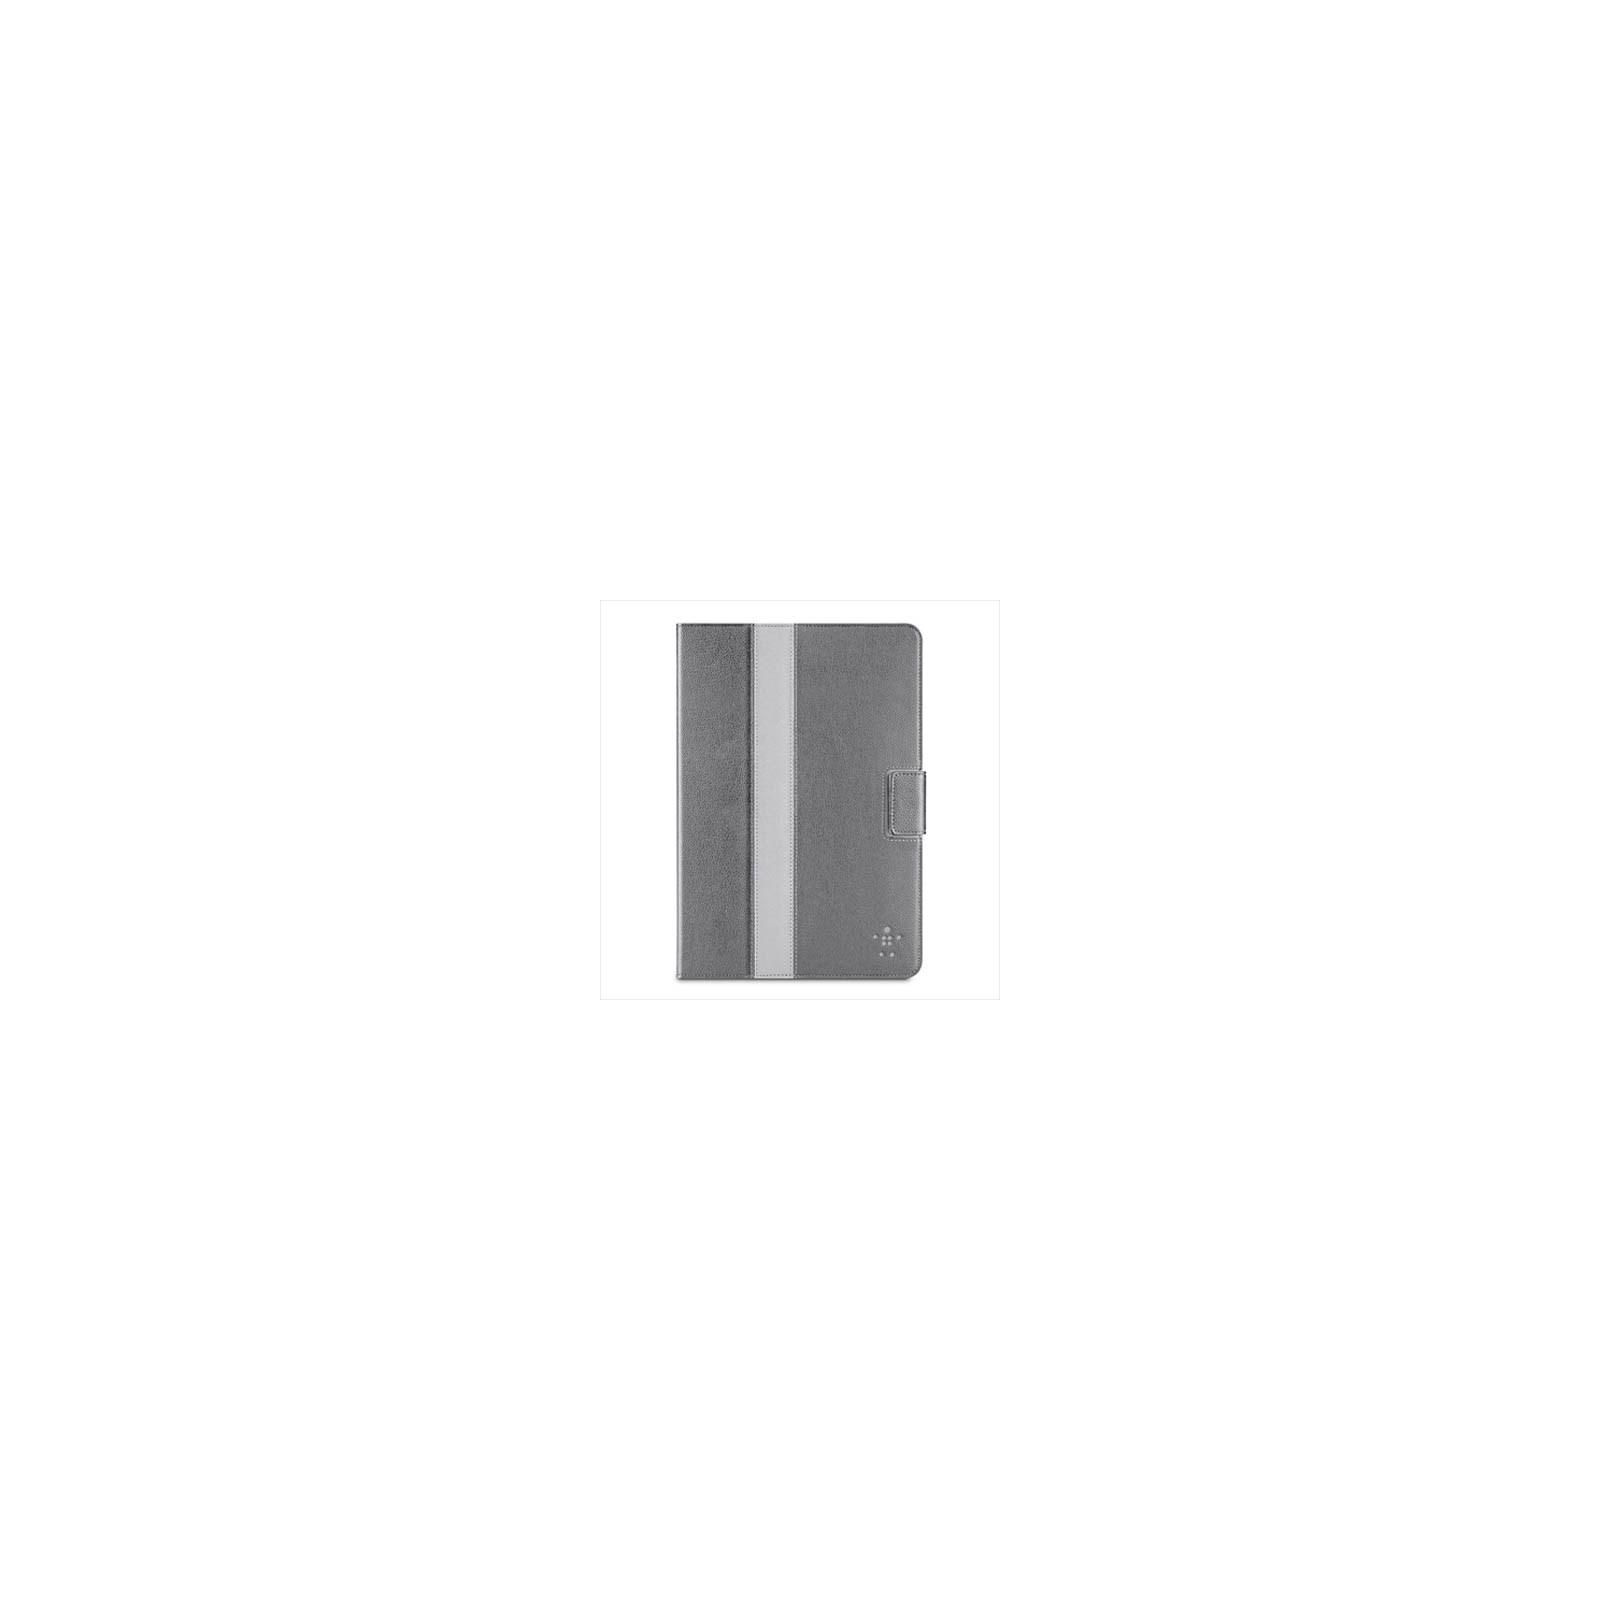 Чехол для планшета Belkin iPad mini Striped Cover Stand (F7N024vfC01)